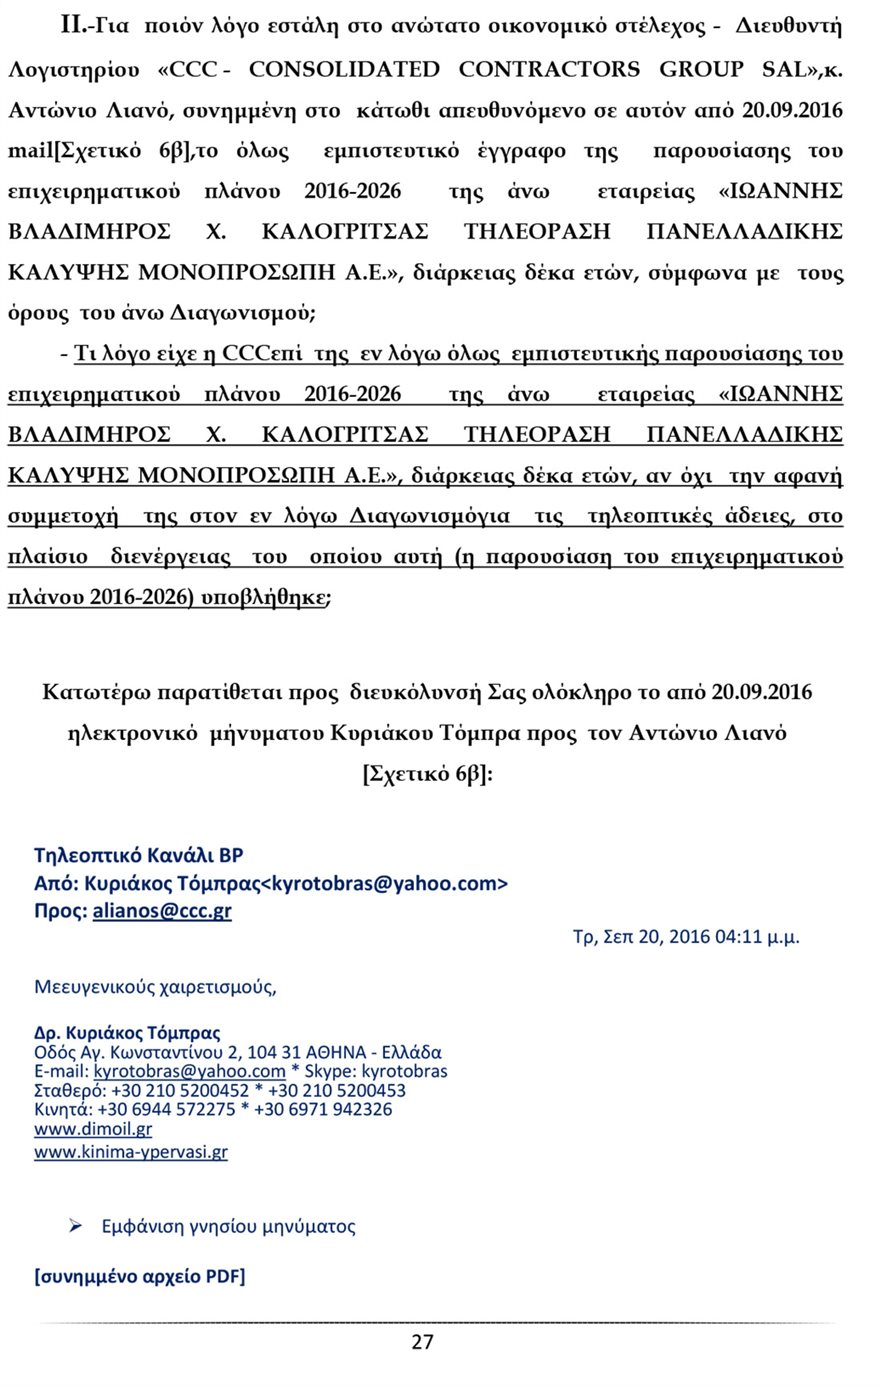 ypomnima-27